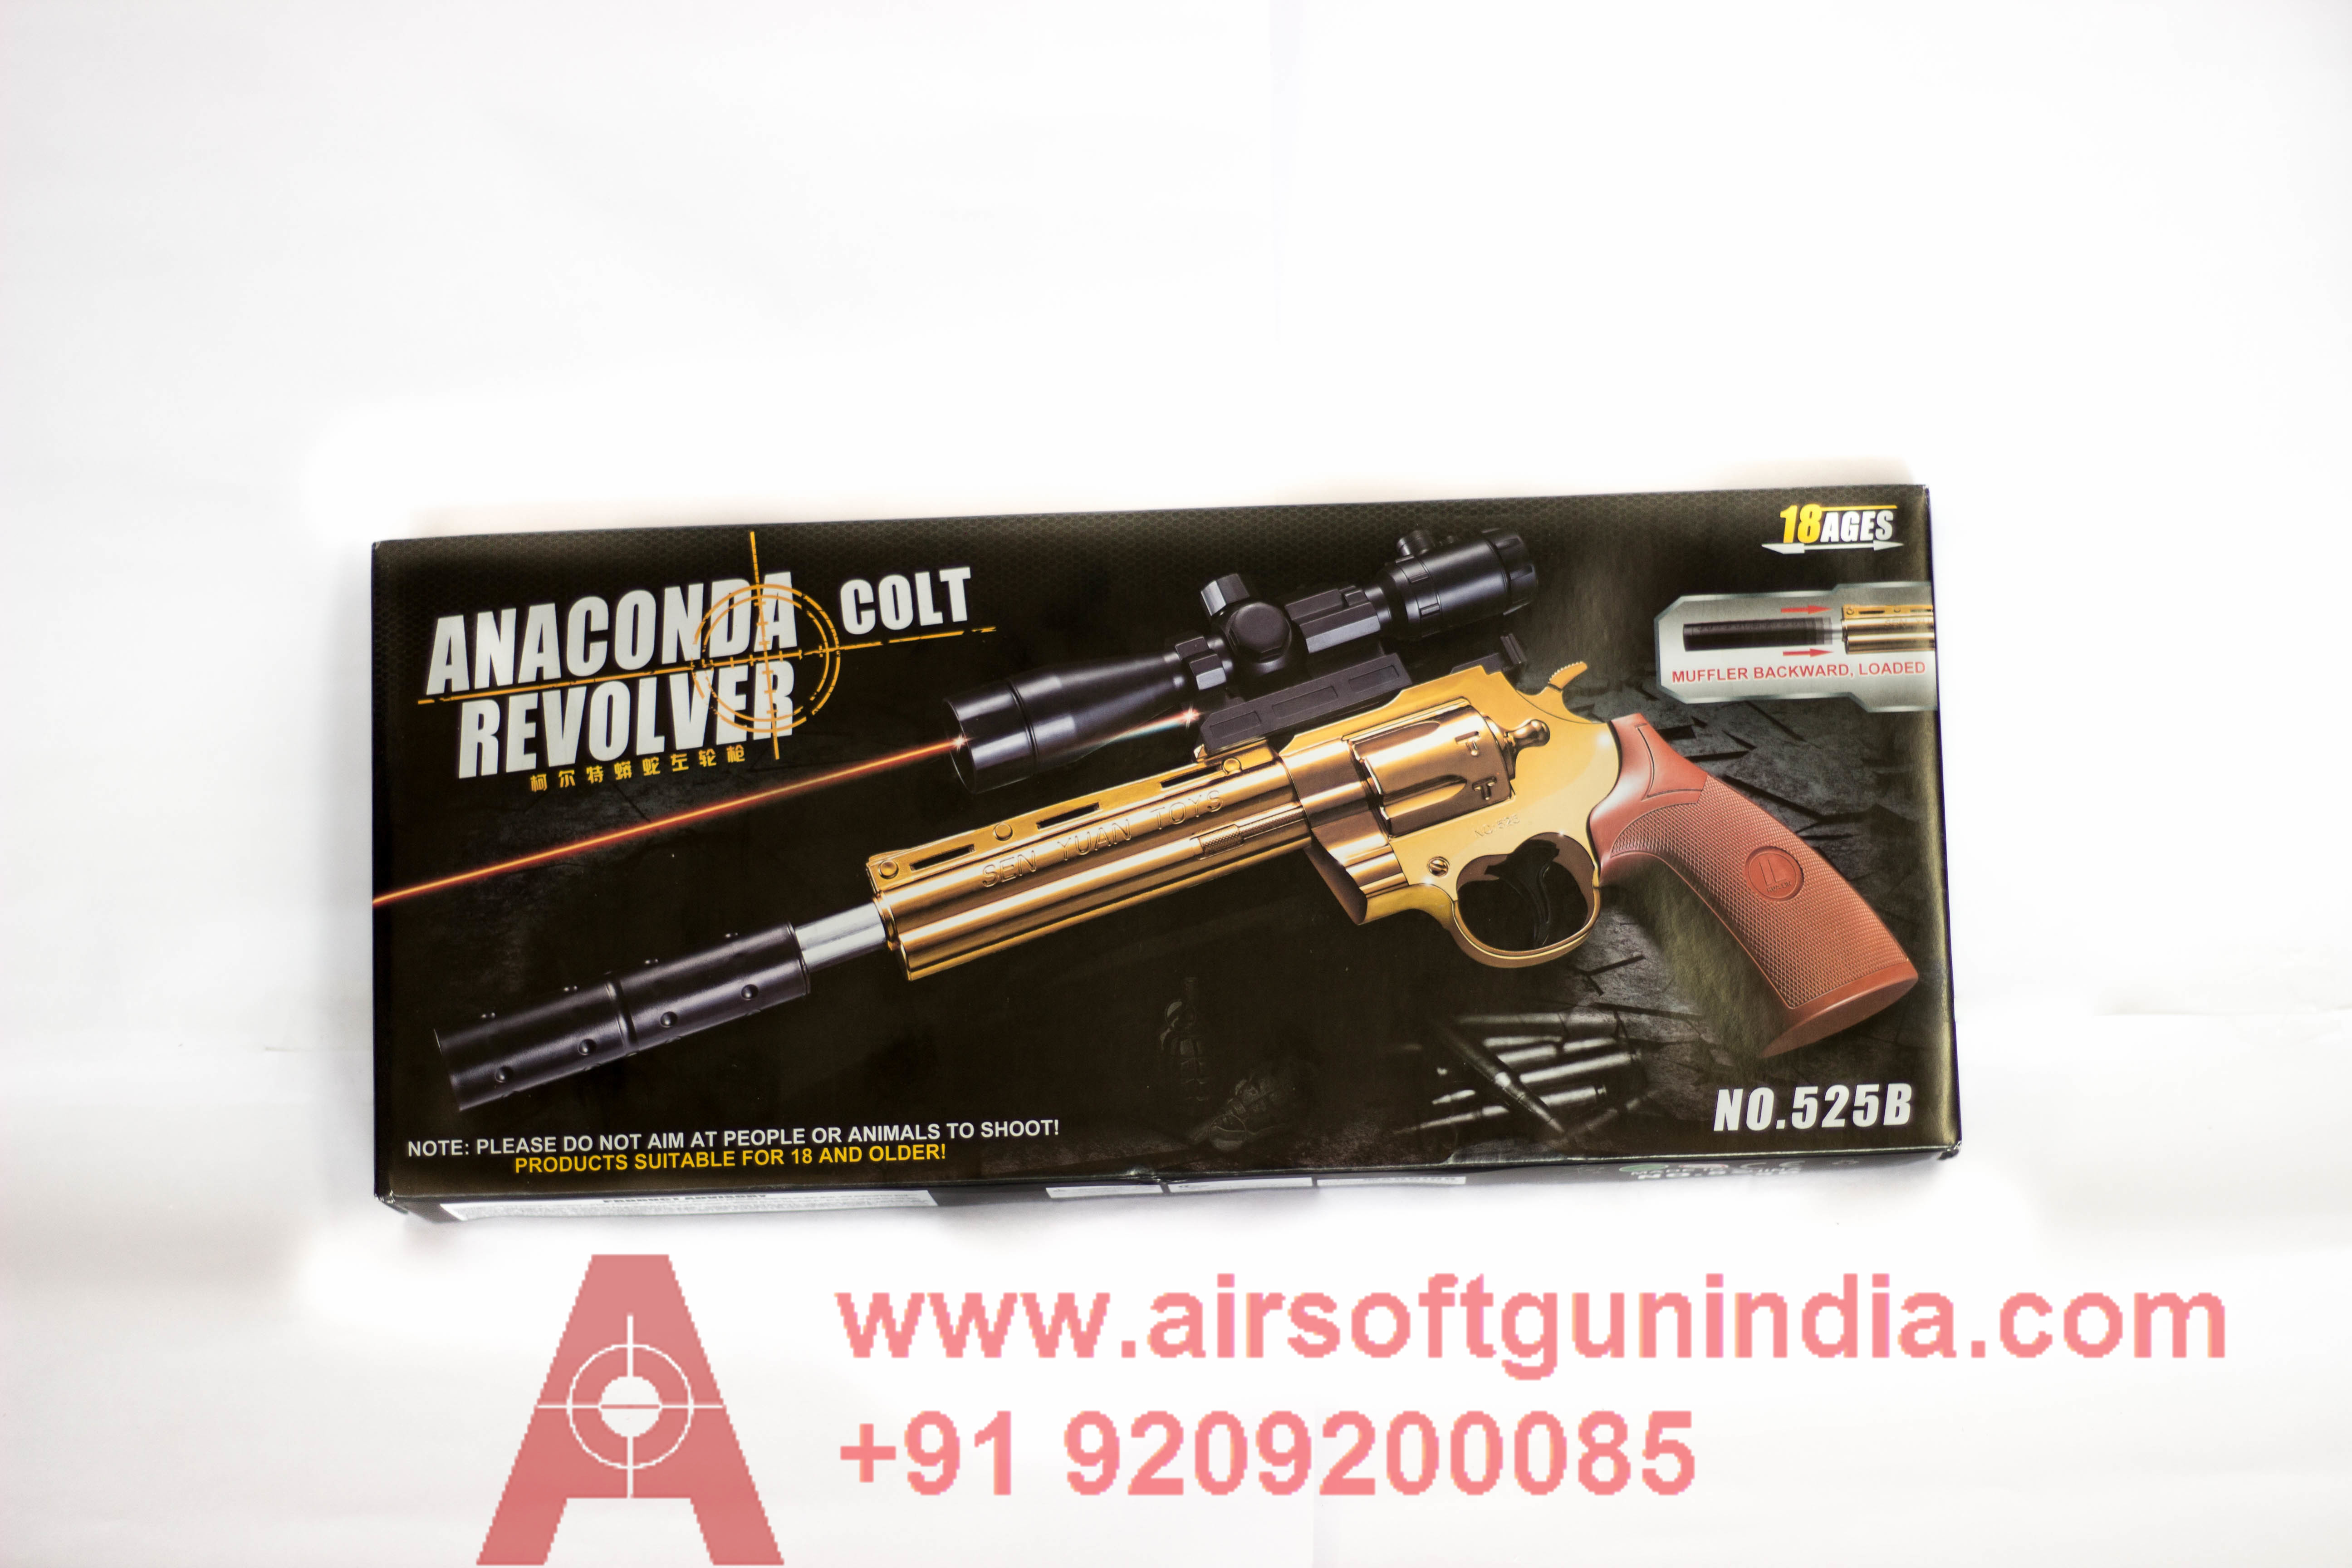 Anaconda Colt Revolver 525B By Airsoft Gun India